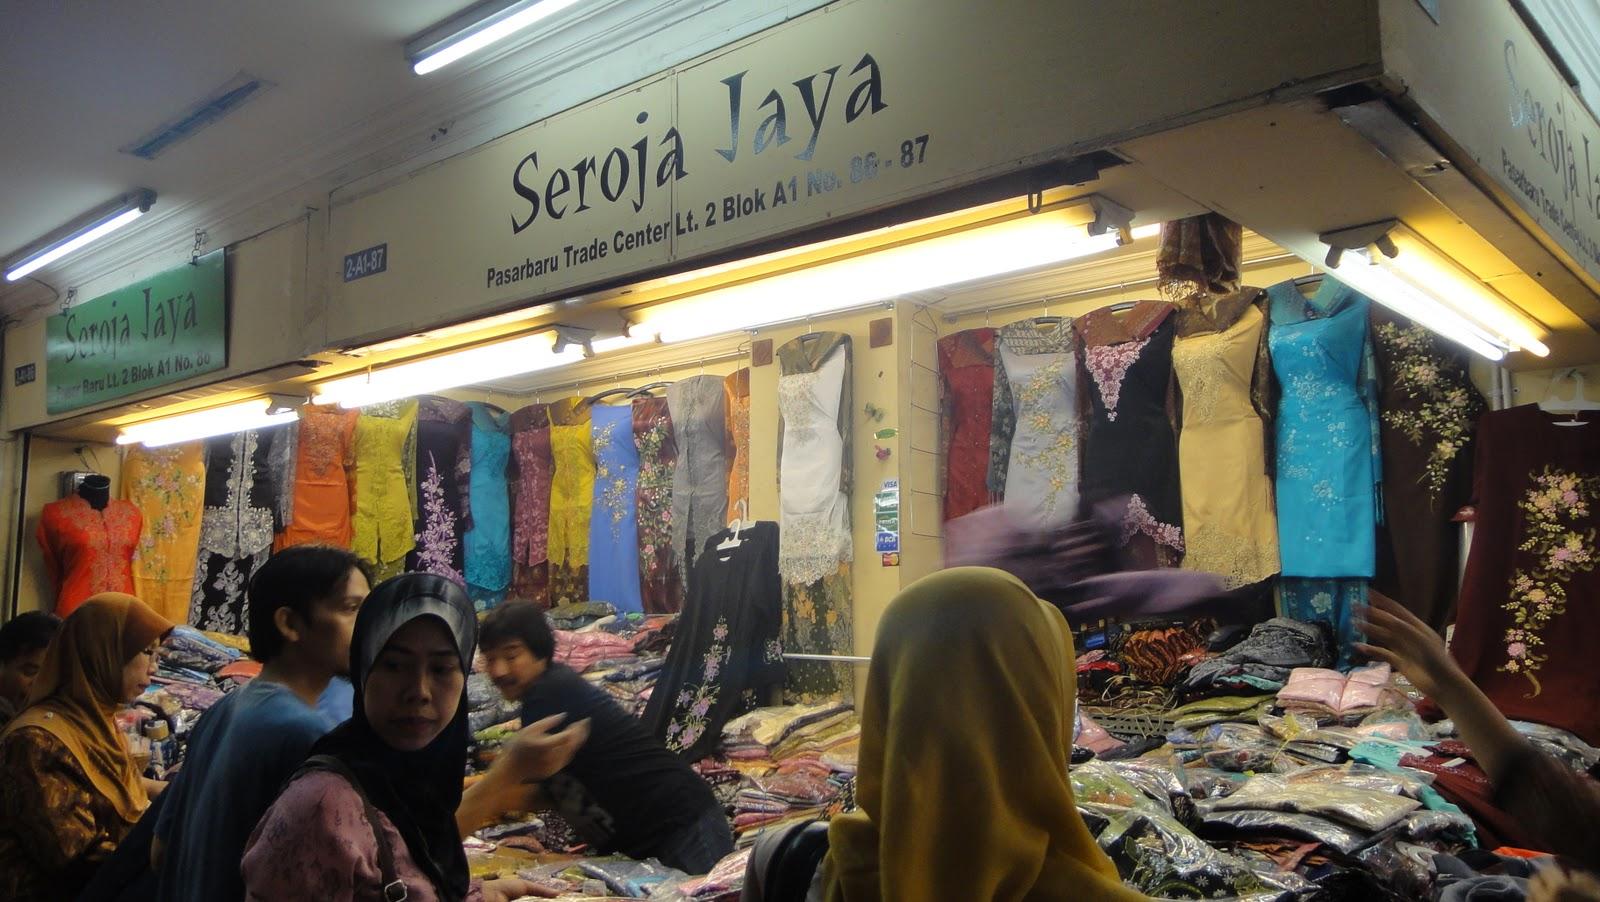 Hati yang gembira pasar baru bandung indonesia Baju gamis pasar baru bandung